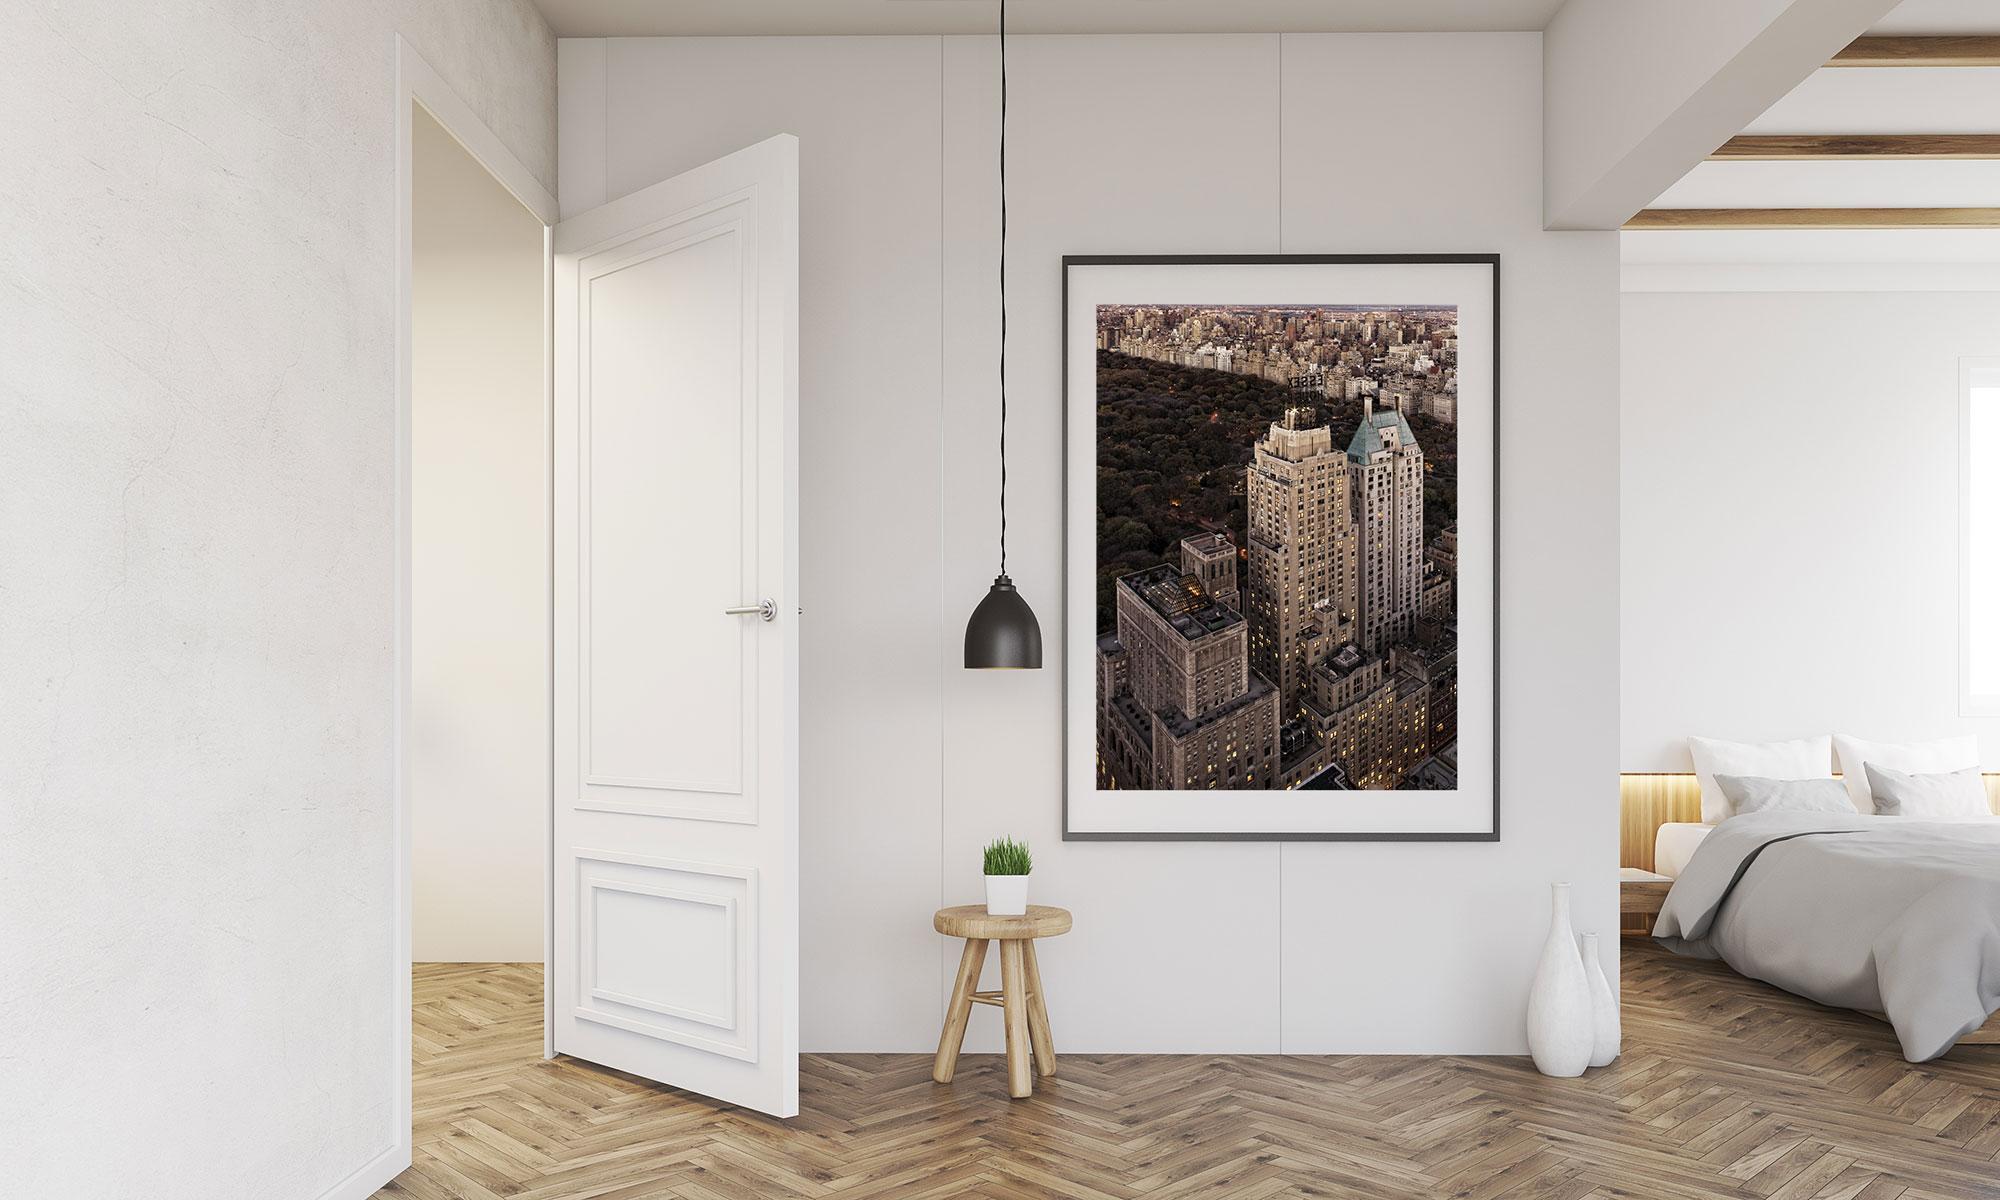 NYLS-Interior-08a.jpg